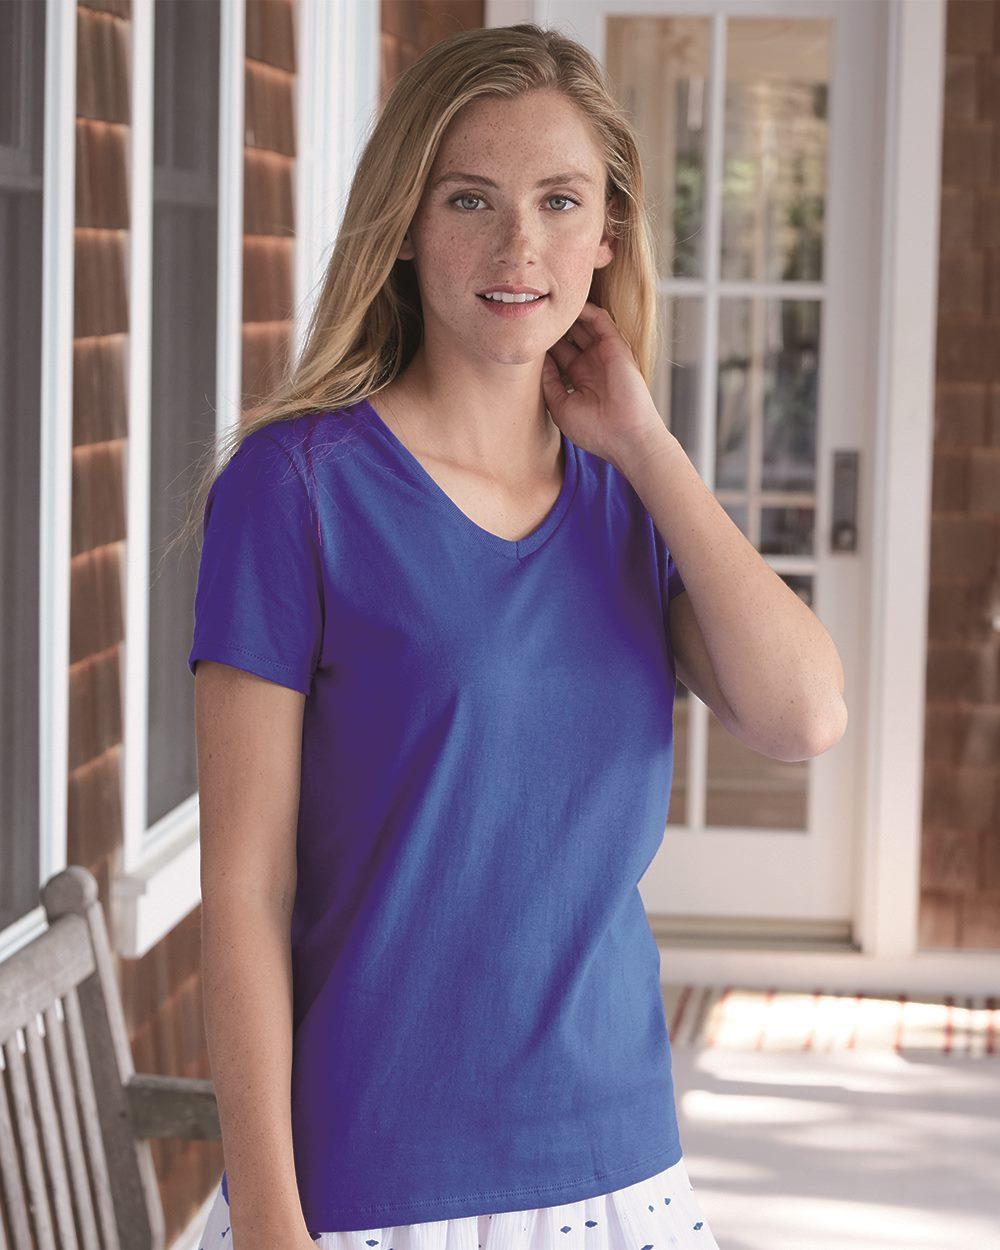 Hanes 5780 - Women's Tagless V-Neck T-Shirt